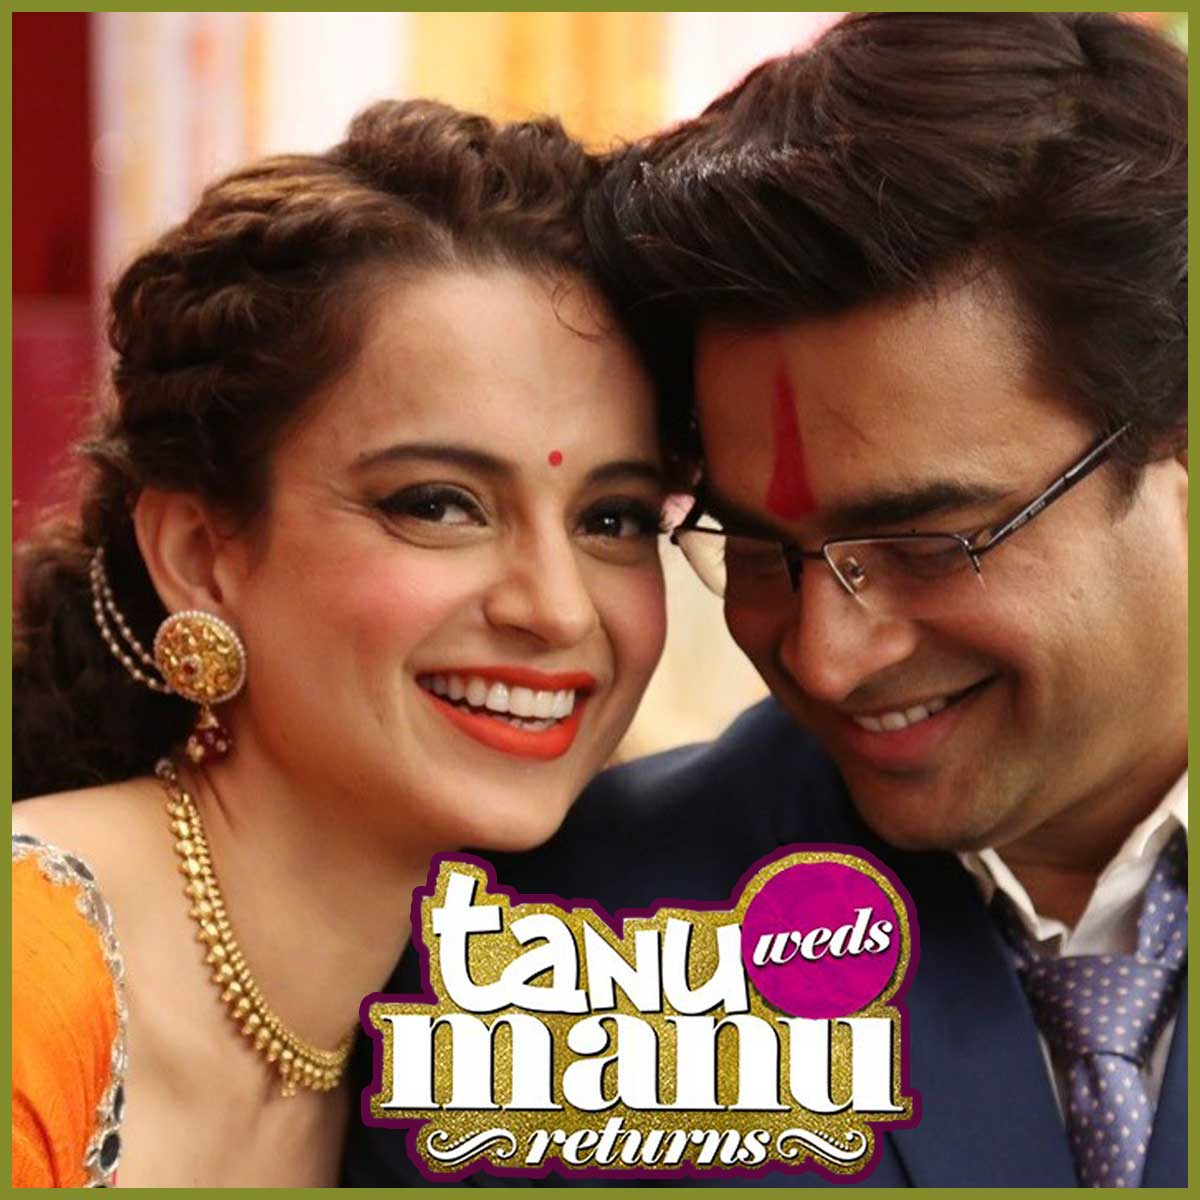 Manu Tu Lajabadshia Mp3 Song: Tanu Weds Manu Returns Karaoke